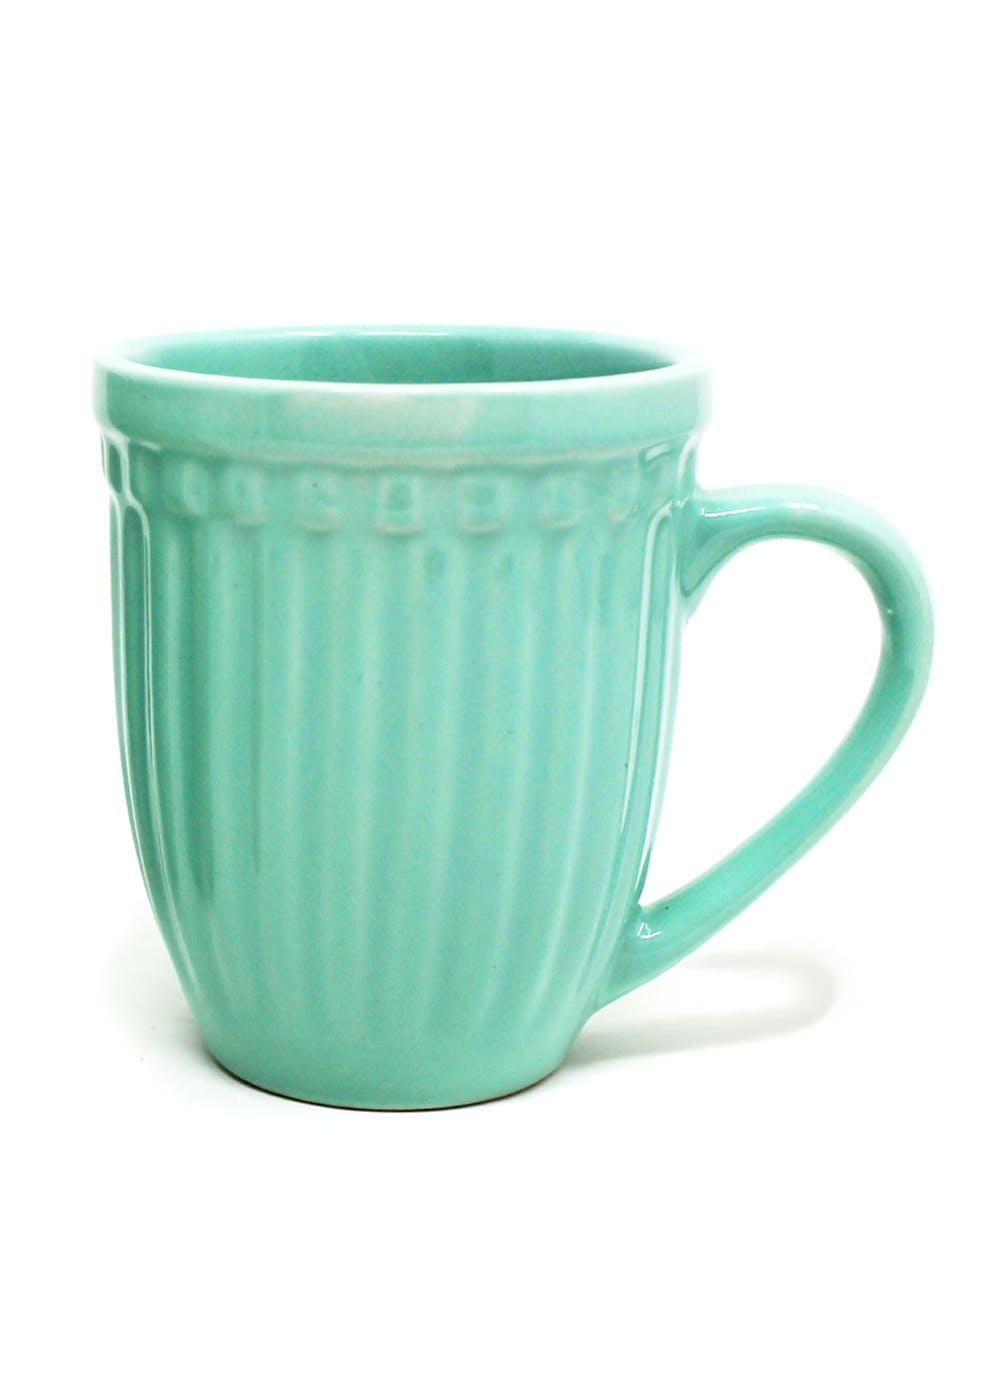 Glam Matte Ceramic Mug - Mint